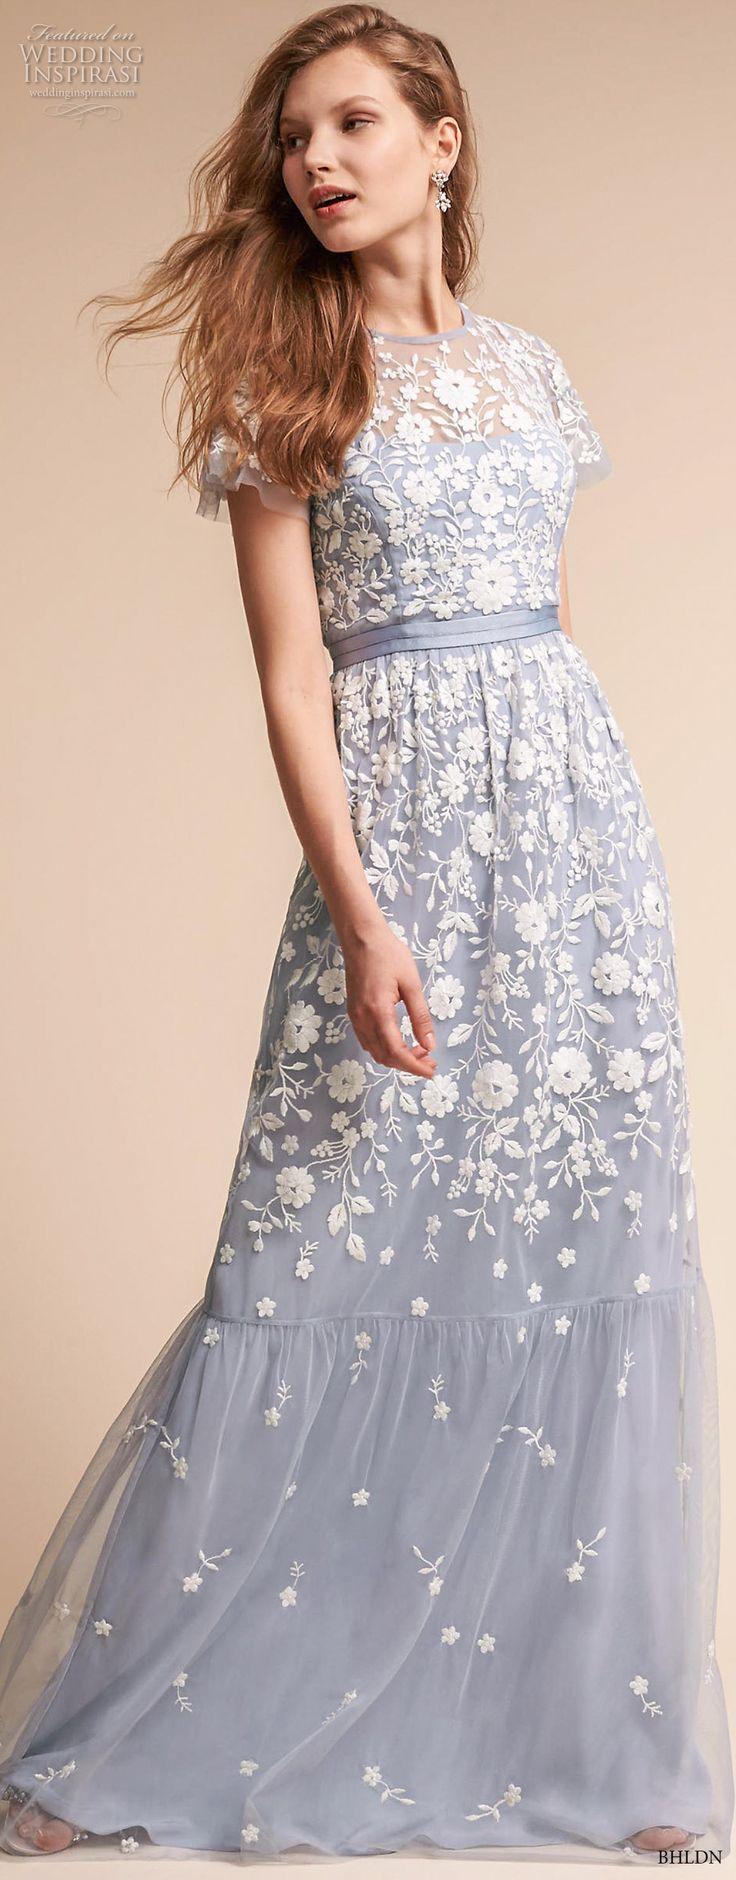 bhldn fall 2017 americana bridal short sleeves jewel neck full embellishment romantic blue color soft a line wedding dress covered lace back sweep train (meadow) mv -- BHLDN Freshest Fall 2017 Wedding Looks